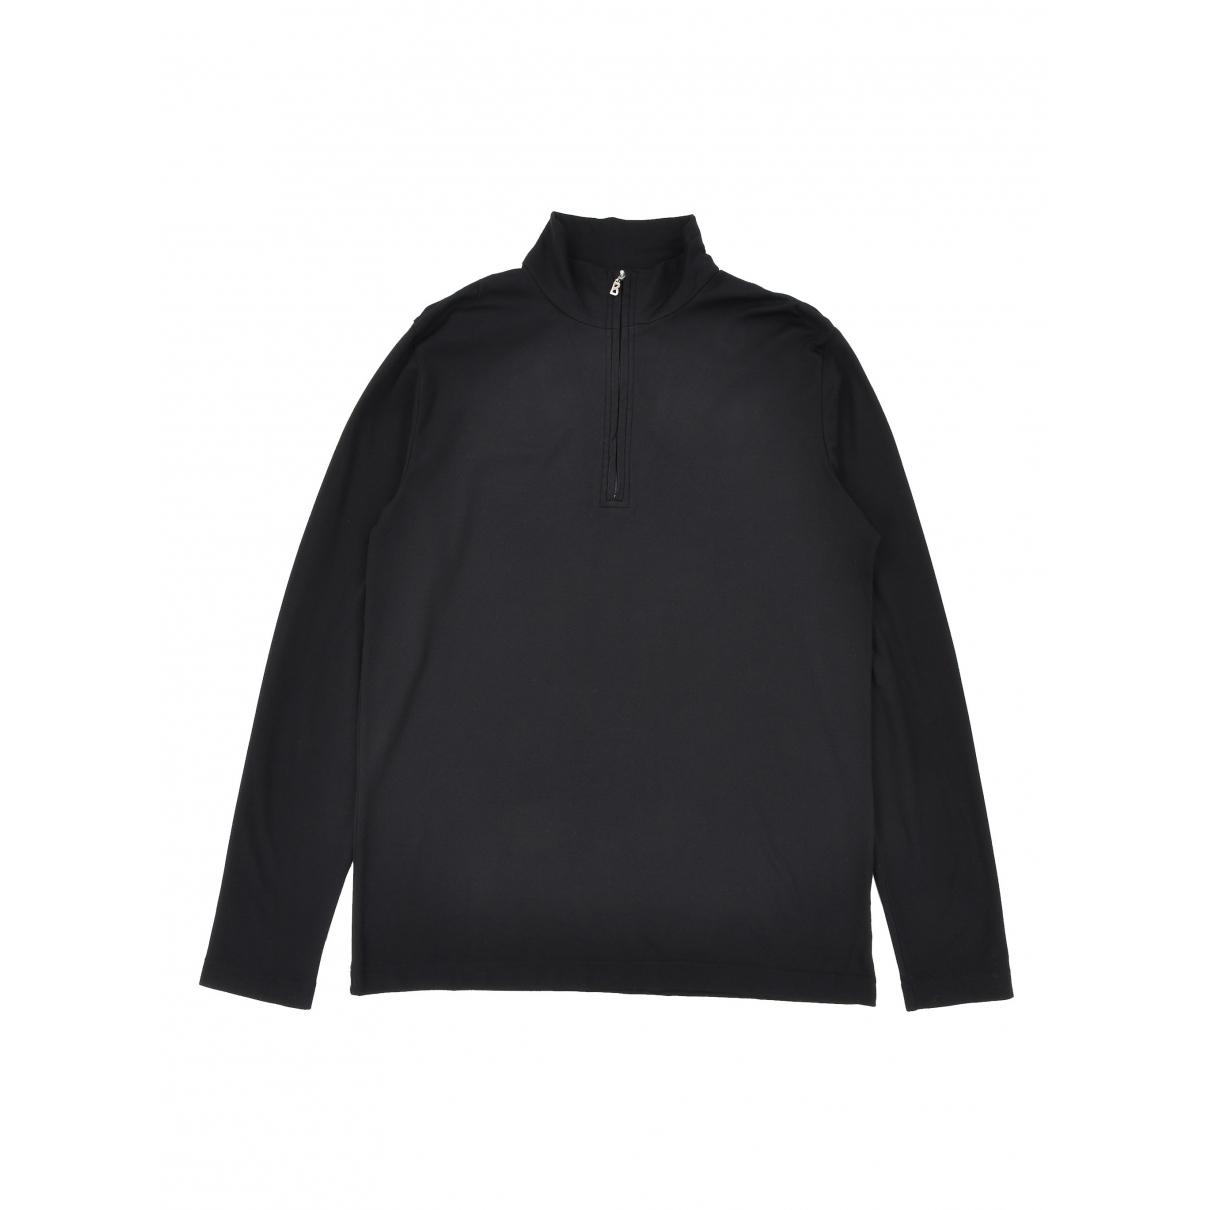 Bogner \N Black Cotton Knitwear & Sweatshirts for Men L International